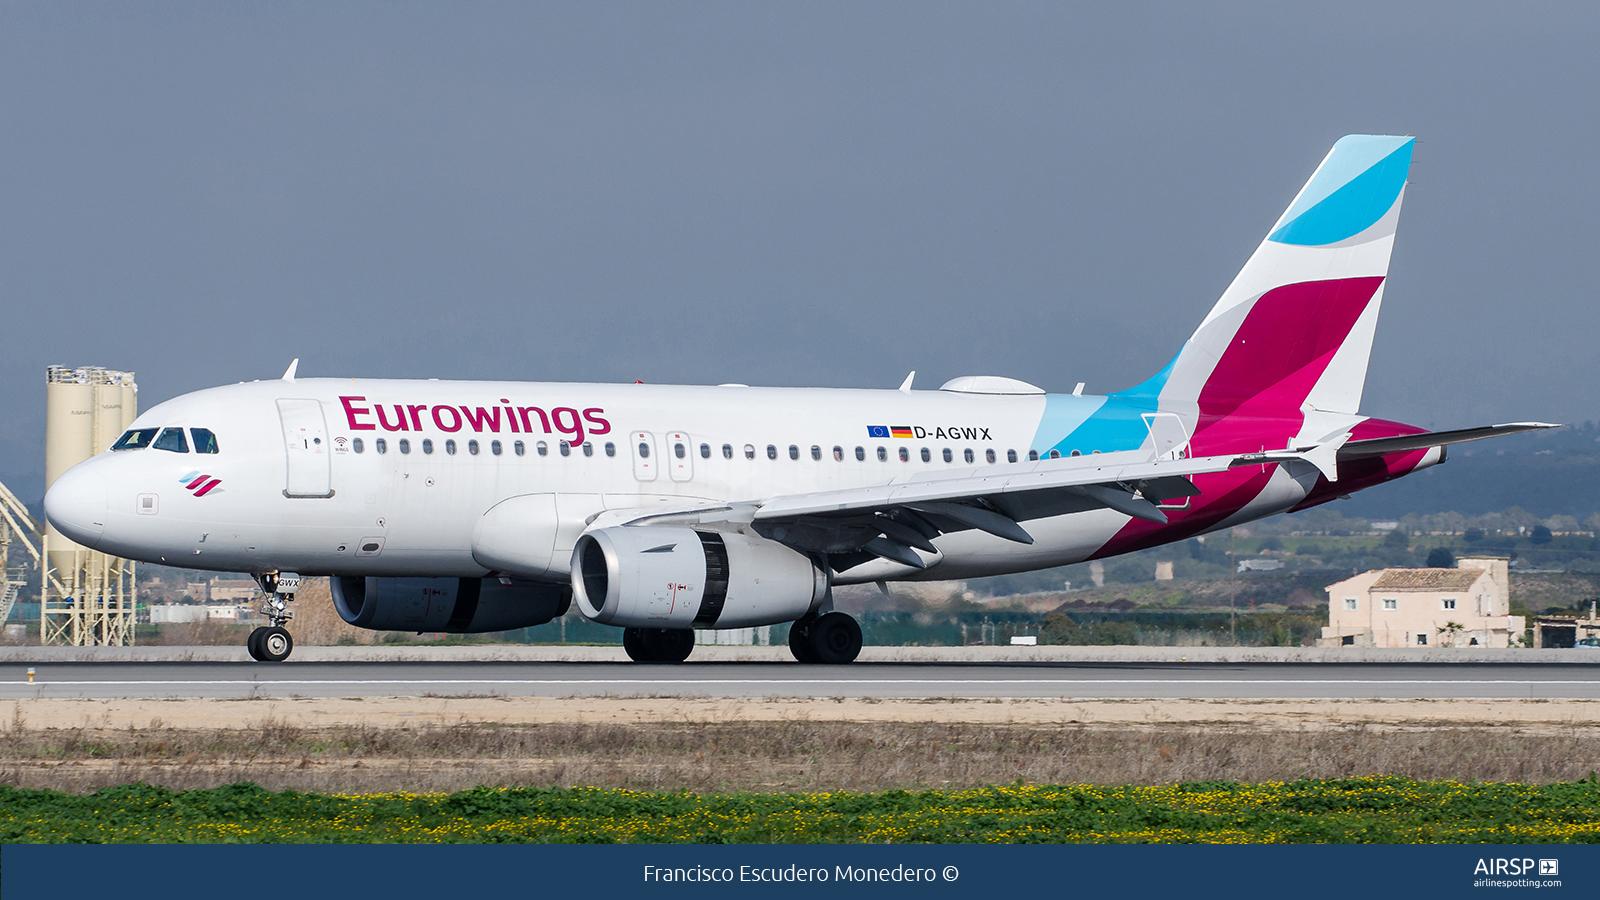 Eurowings  Airbus A319  D-AGWX